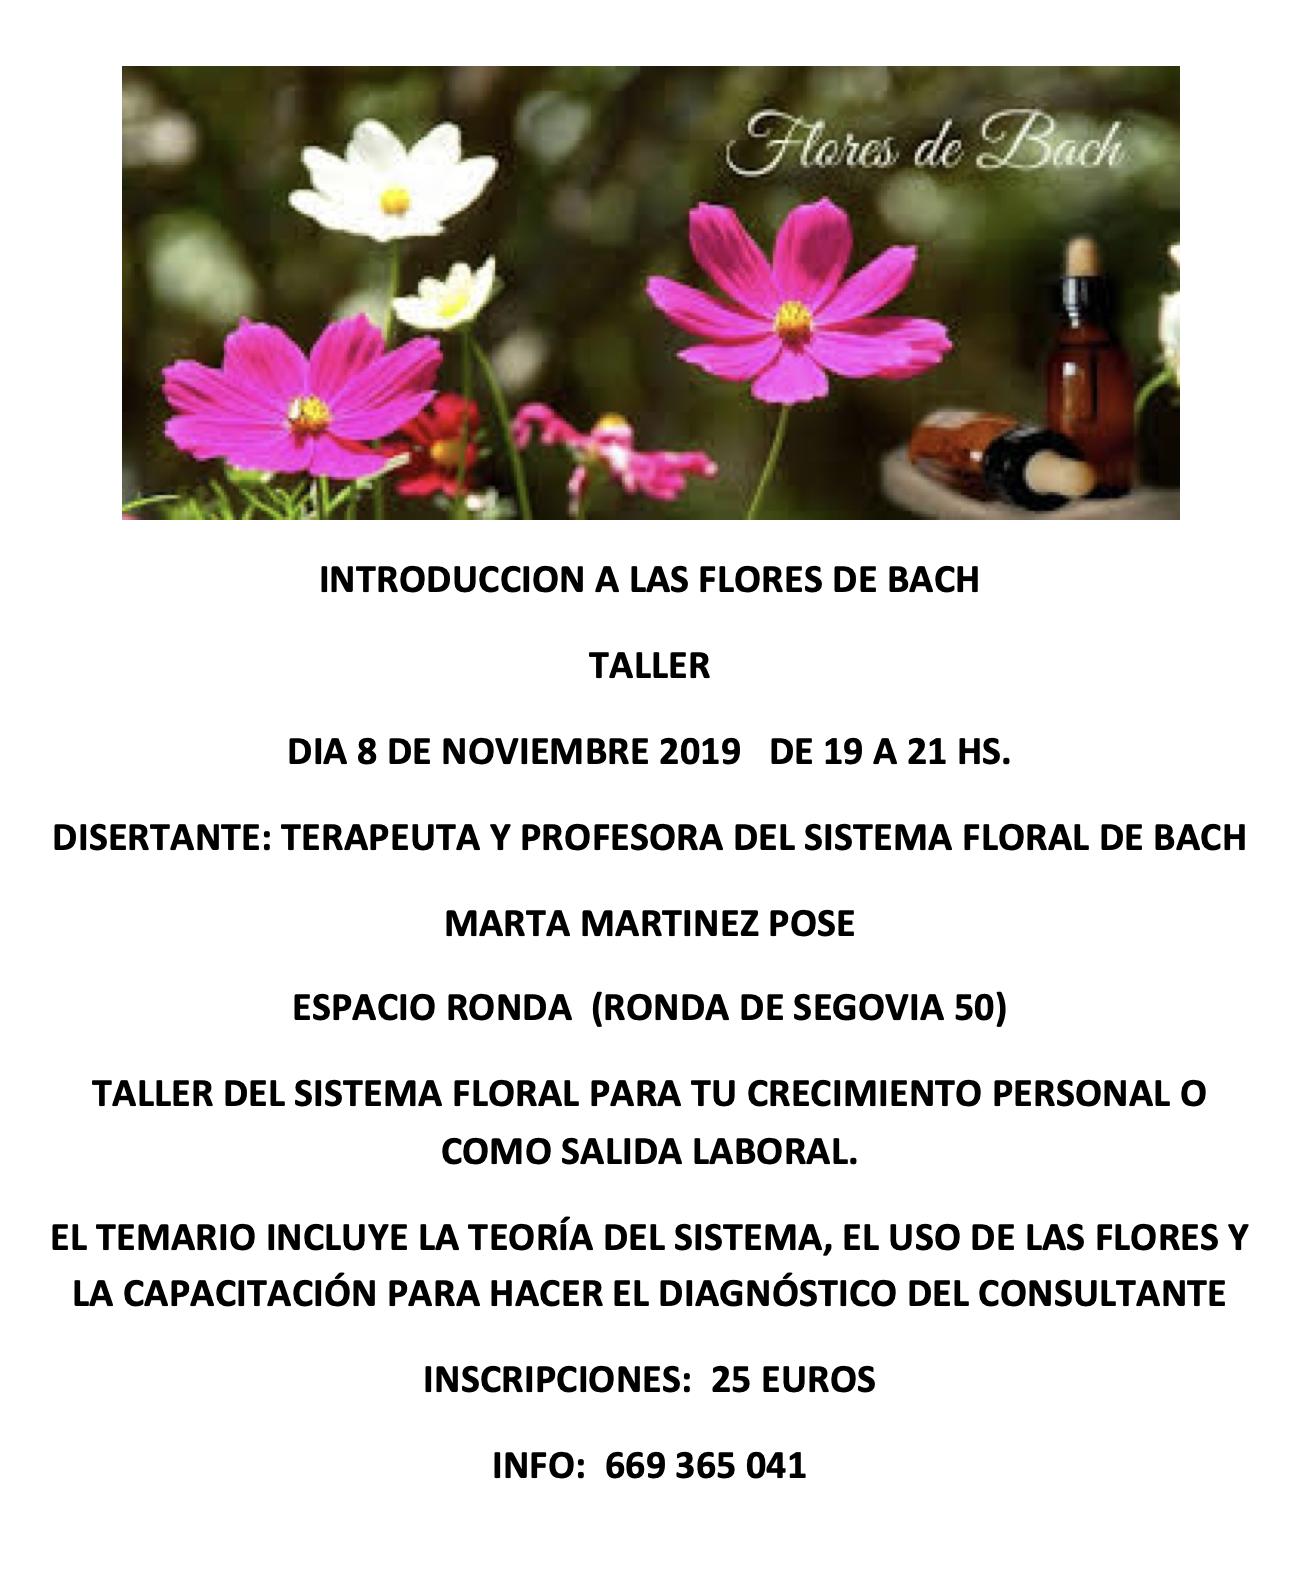 Taller Introducción a las Flores de Bach con Marta Martinez Pose